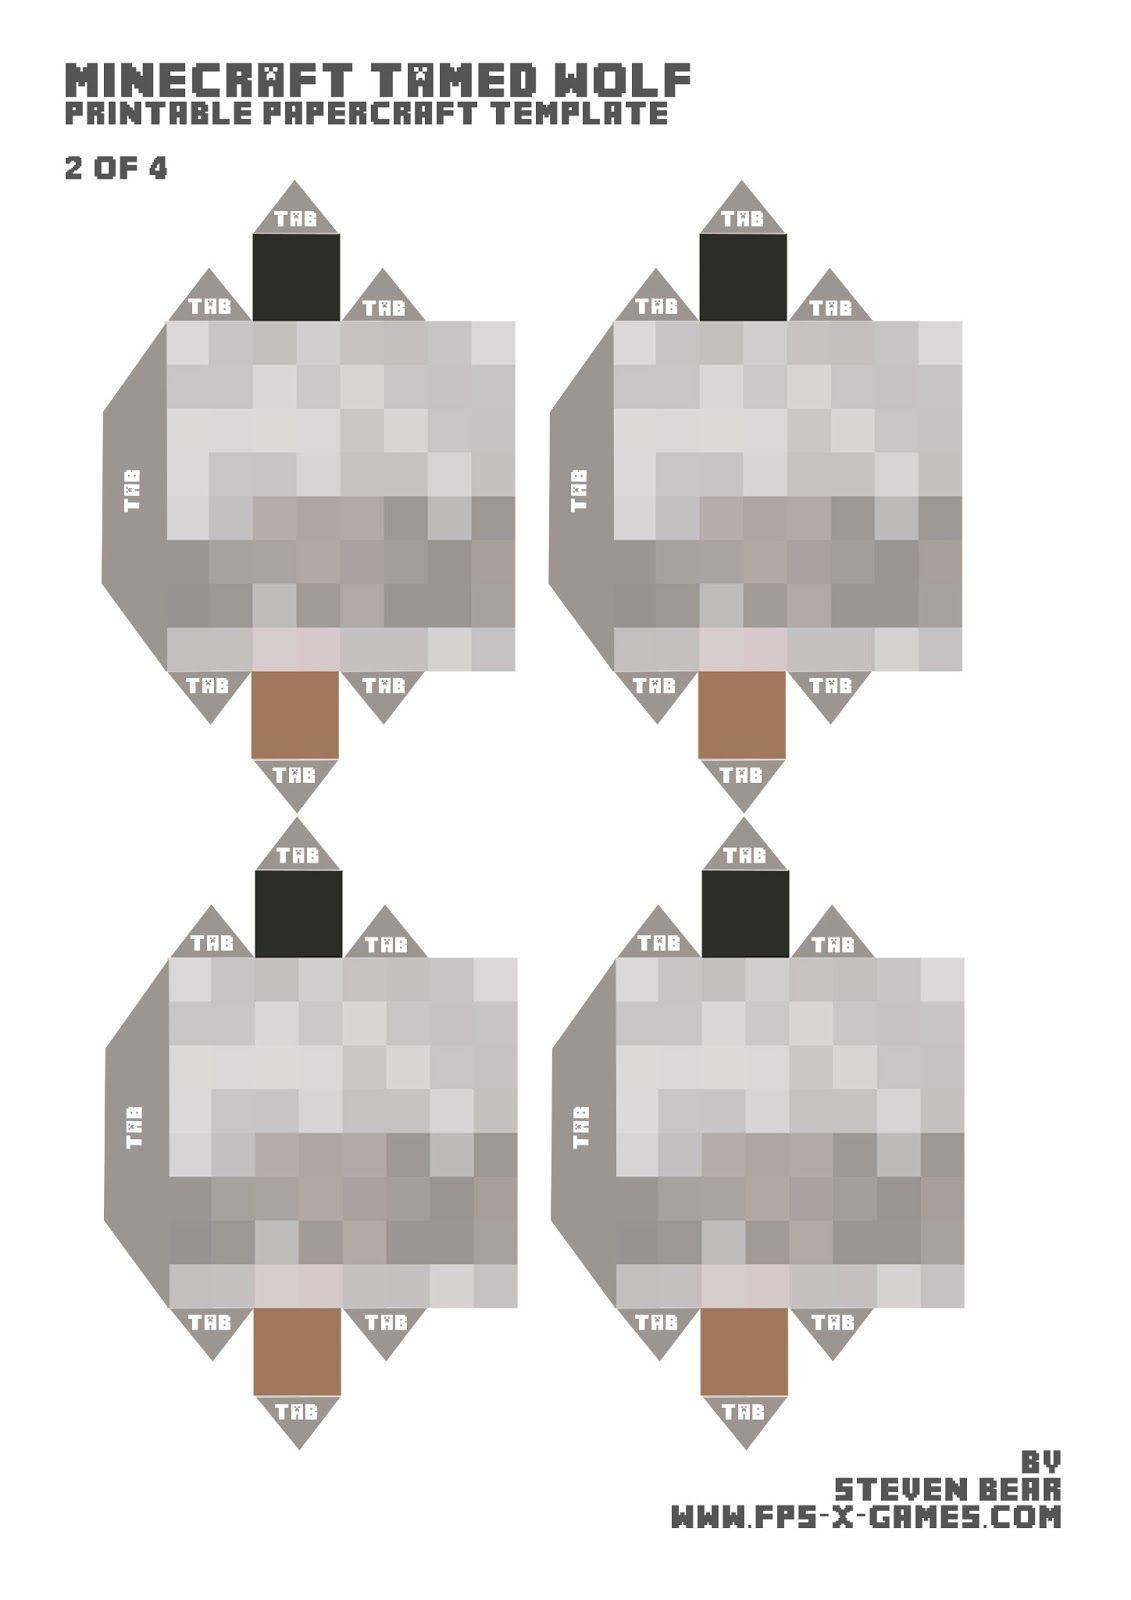 Minecraft Snow Golem Printable Papercraft Template 2 Of 3